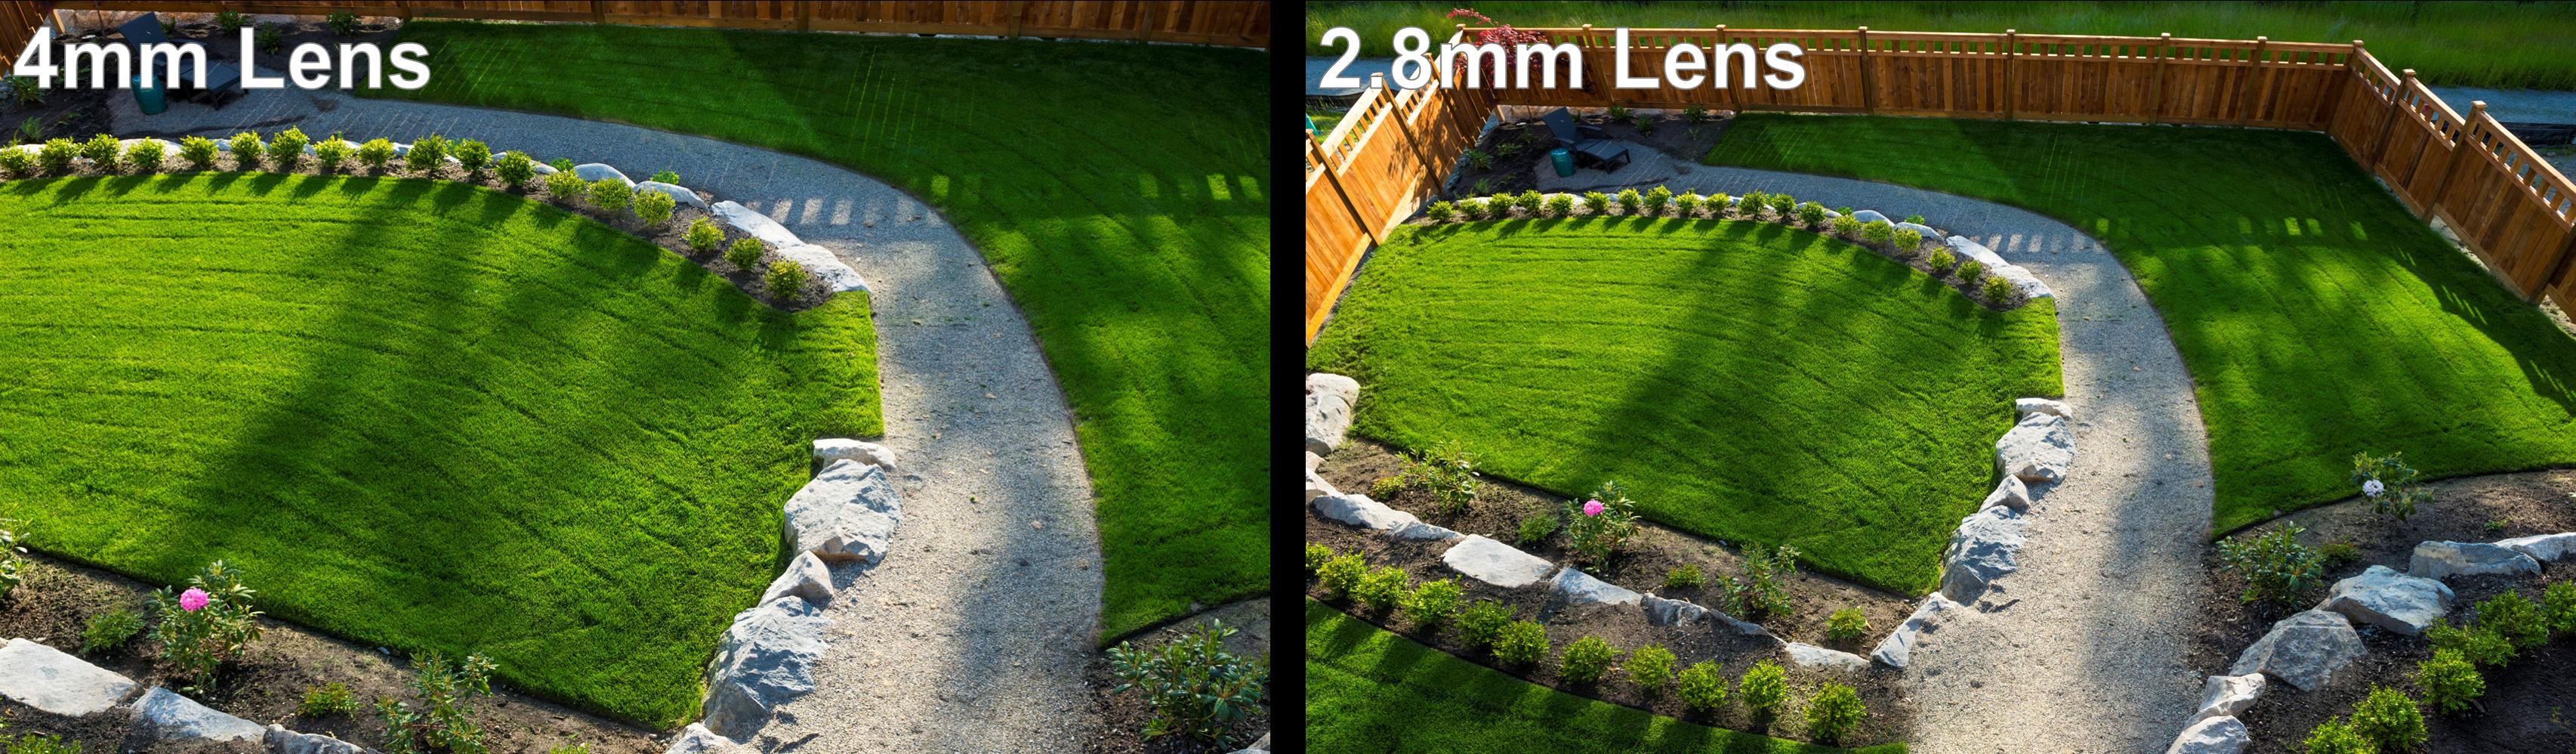 Camera Focal Length Comparison (Backyard)